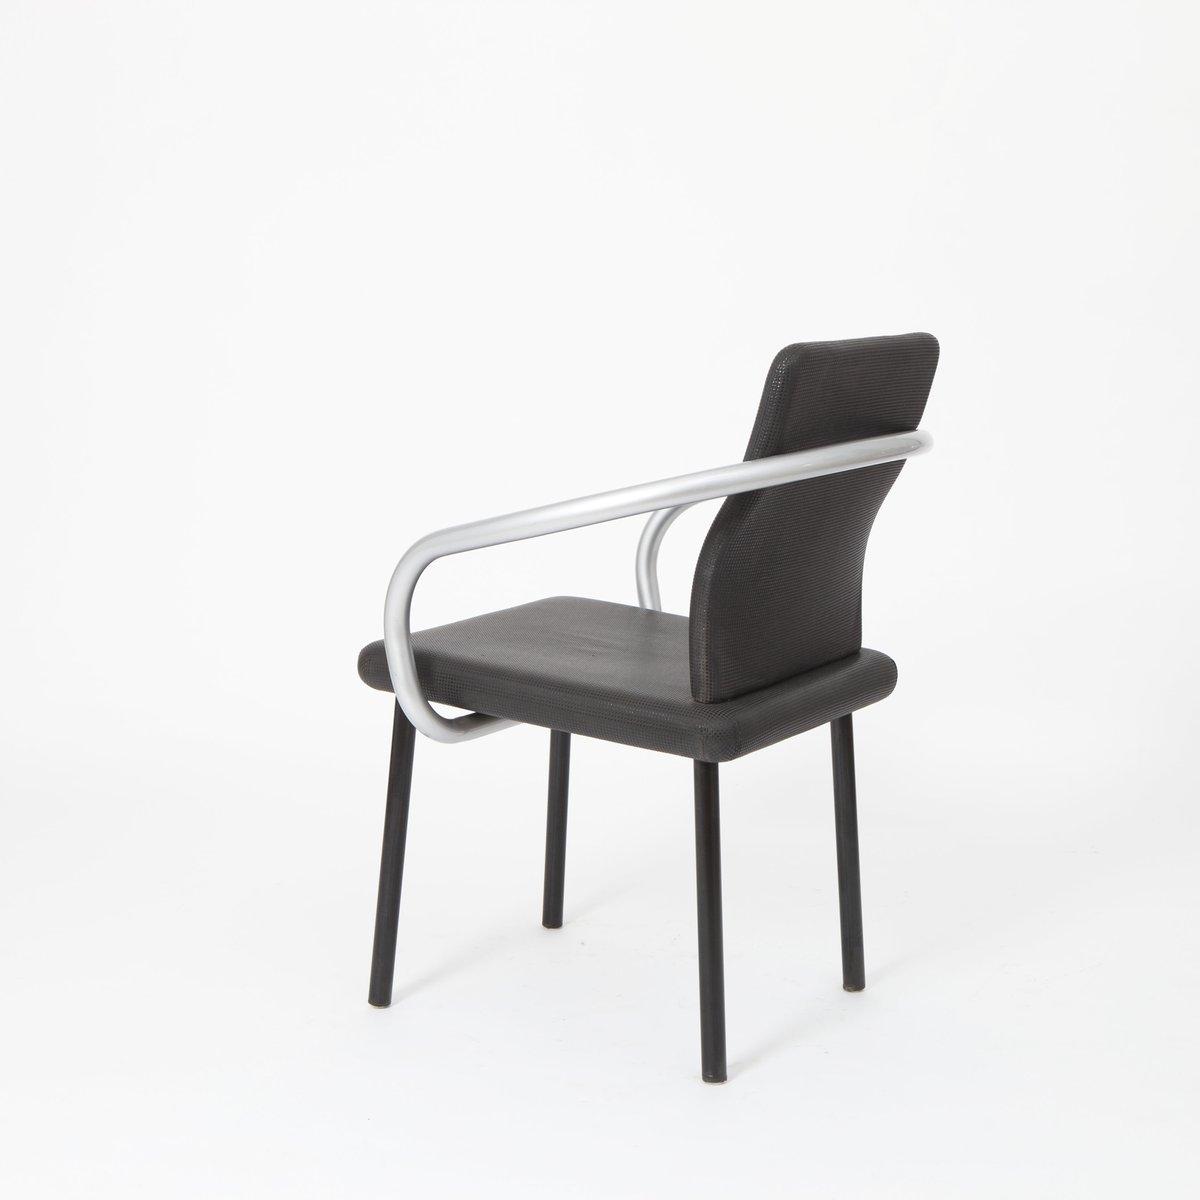 mandarin st hle von ettore sottsass f r knoll 1986 4er set bei pamono kaufen. Black Bedroom Furniture Sets. Home Design Ideas